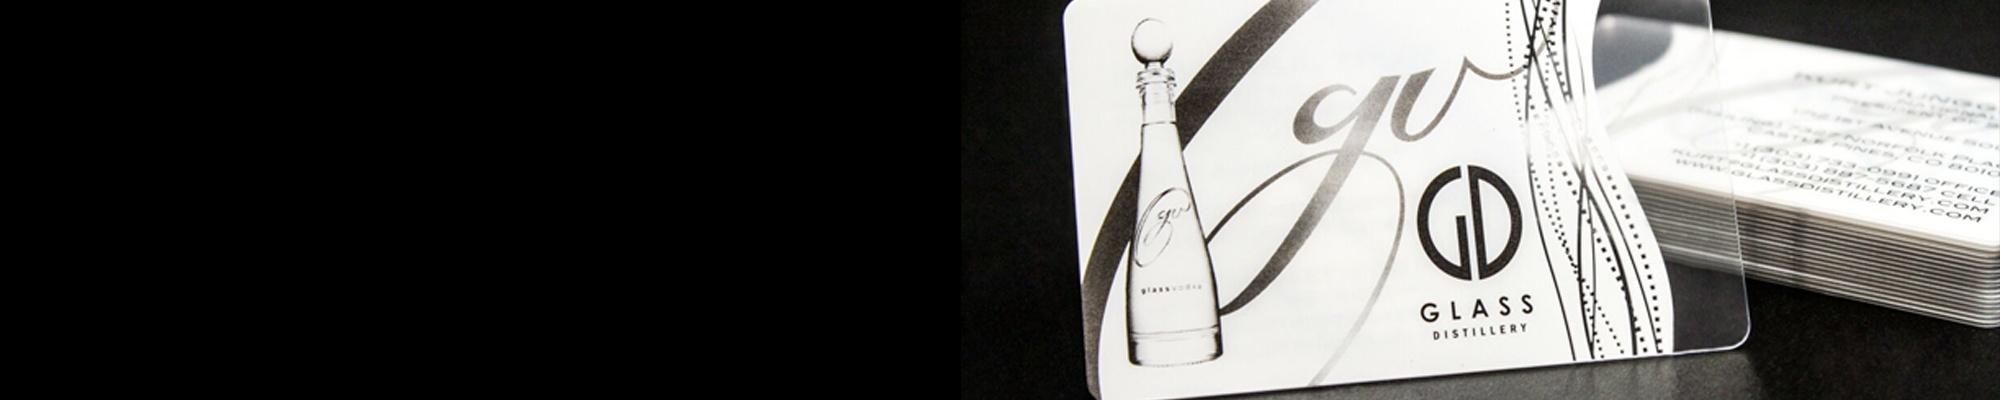 custom-business-card-2.jpg